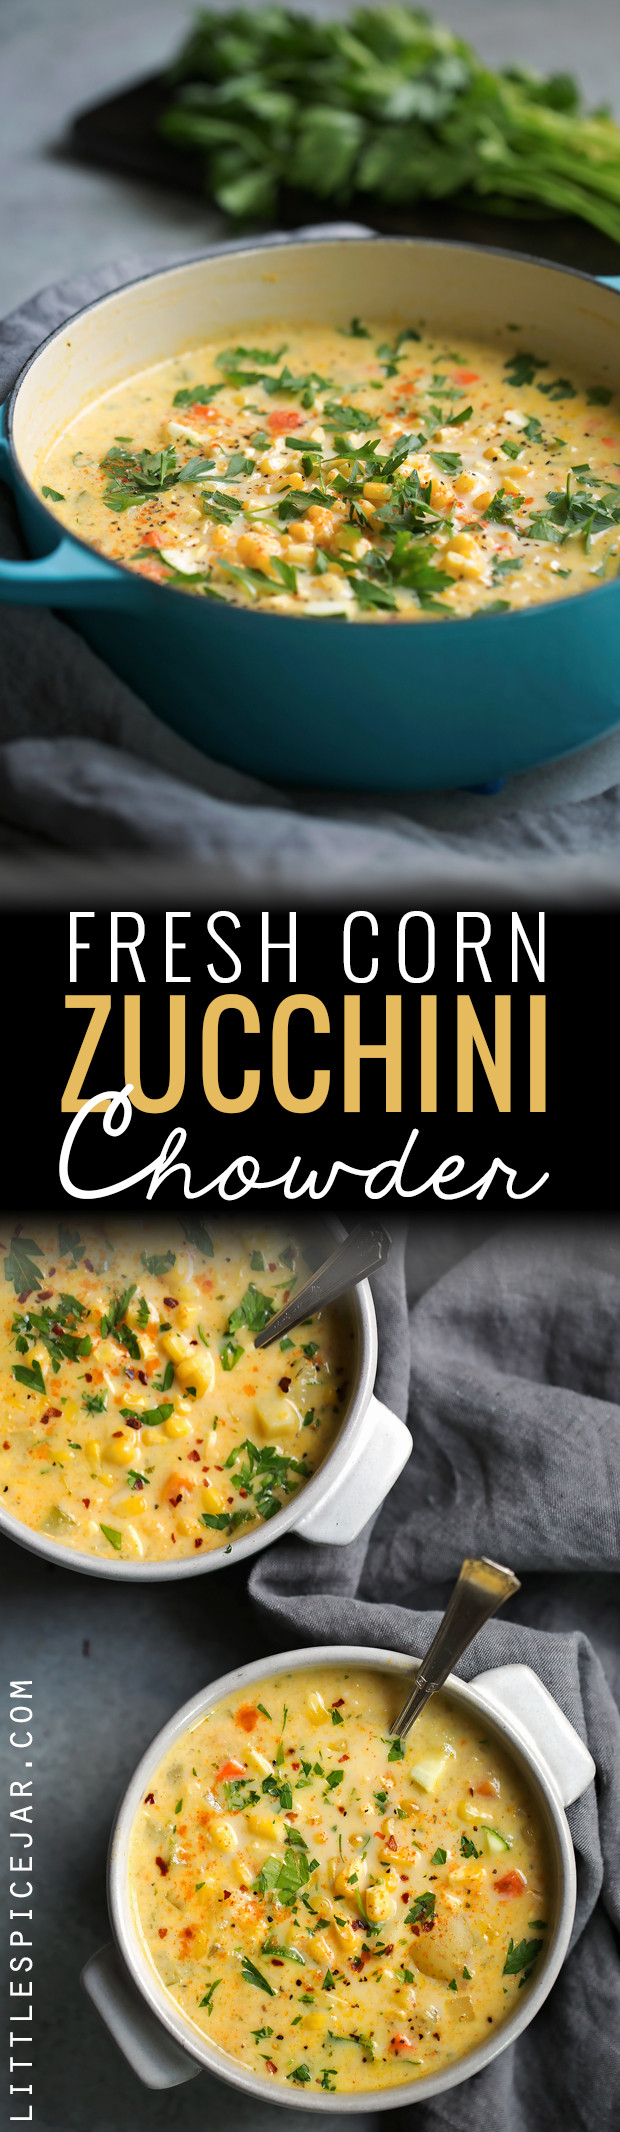 Summer Corn Chowder  Fresh Corn Zucchini Chowder Recipe